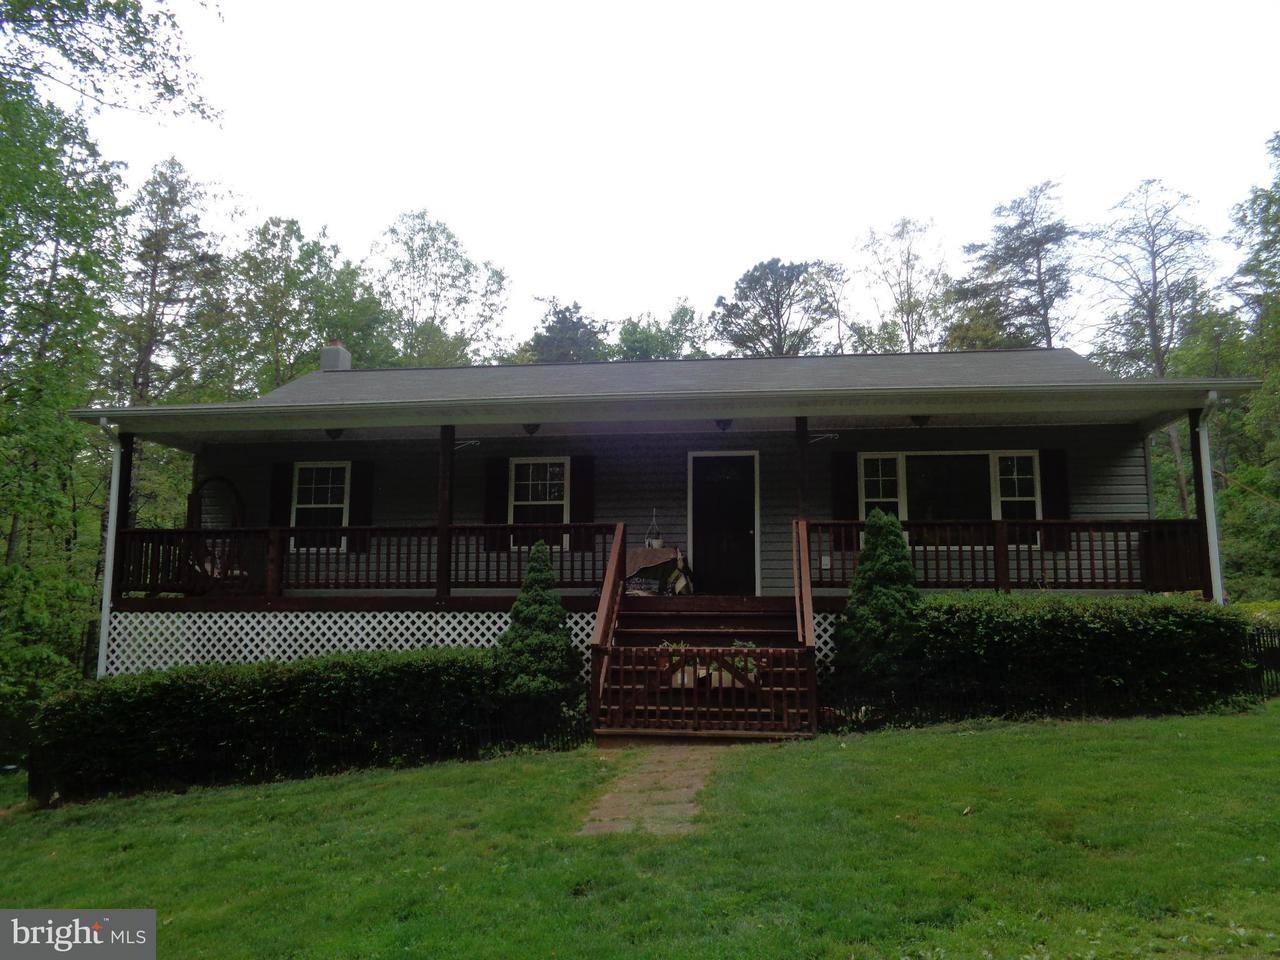 Single Family Home for Sale at 123 Poplar Hollow Lane 123 Poplar Hollow Lane Castleton, Virginia 22716 United States